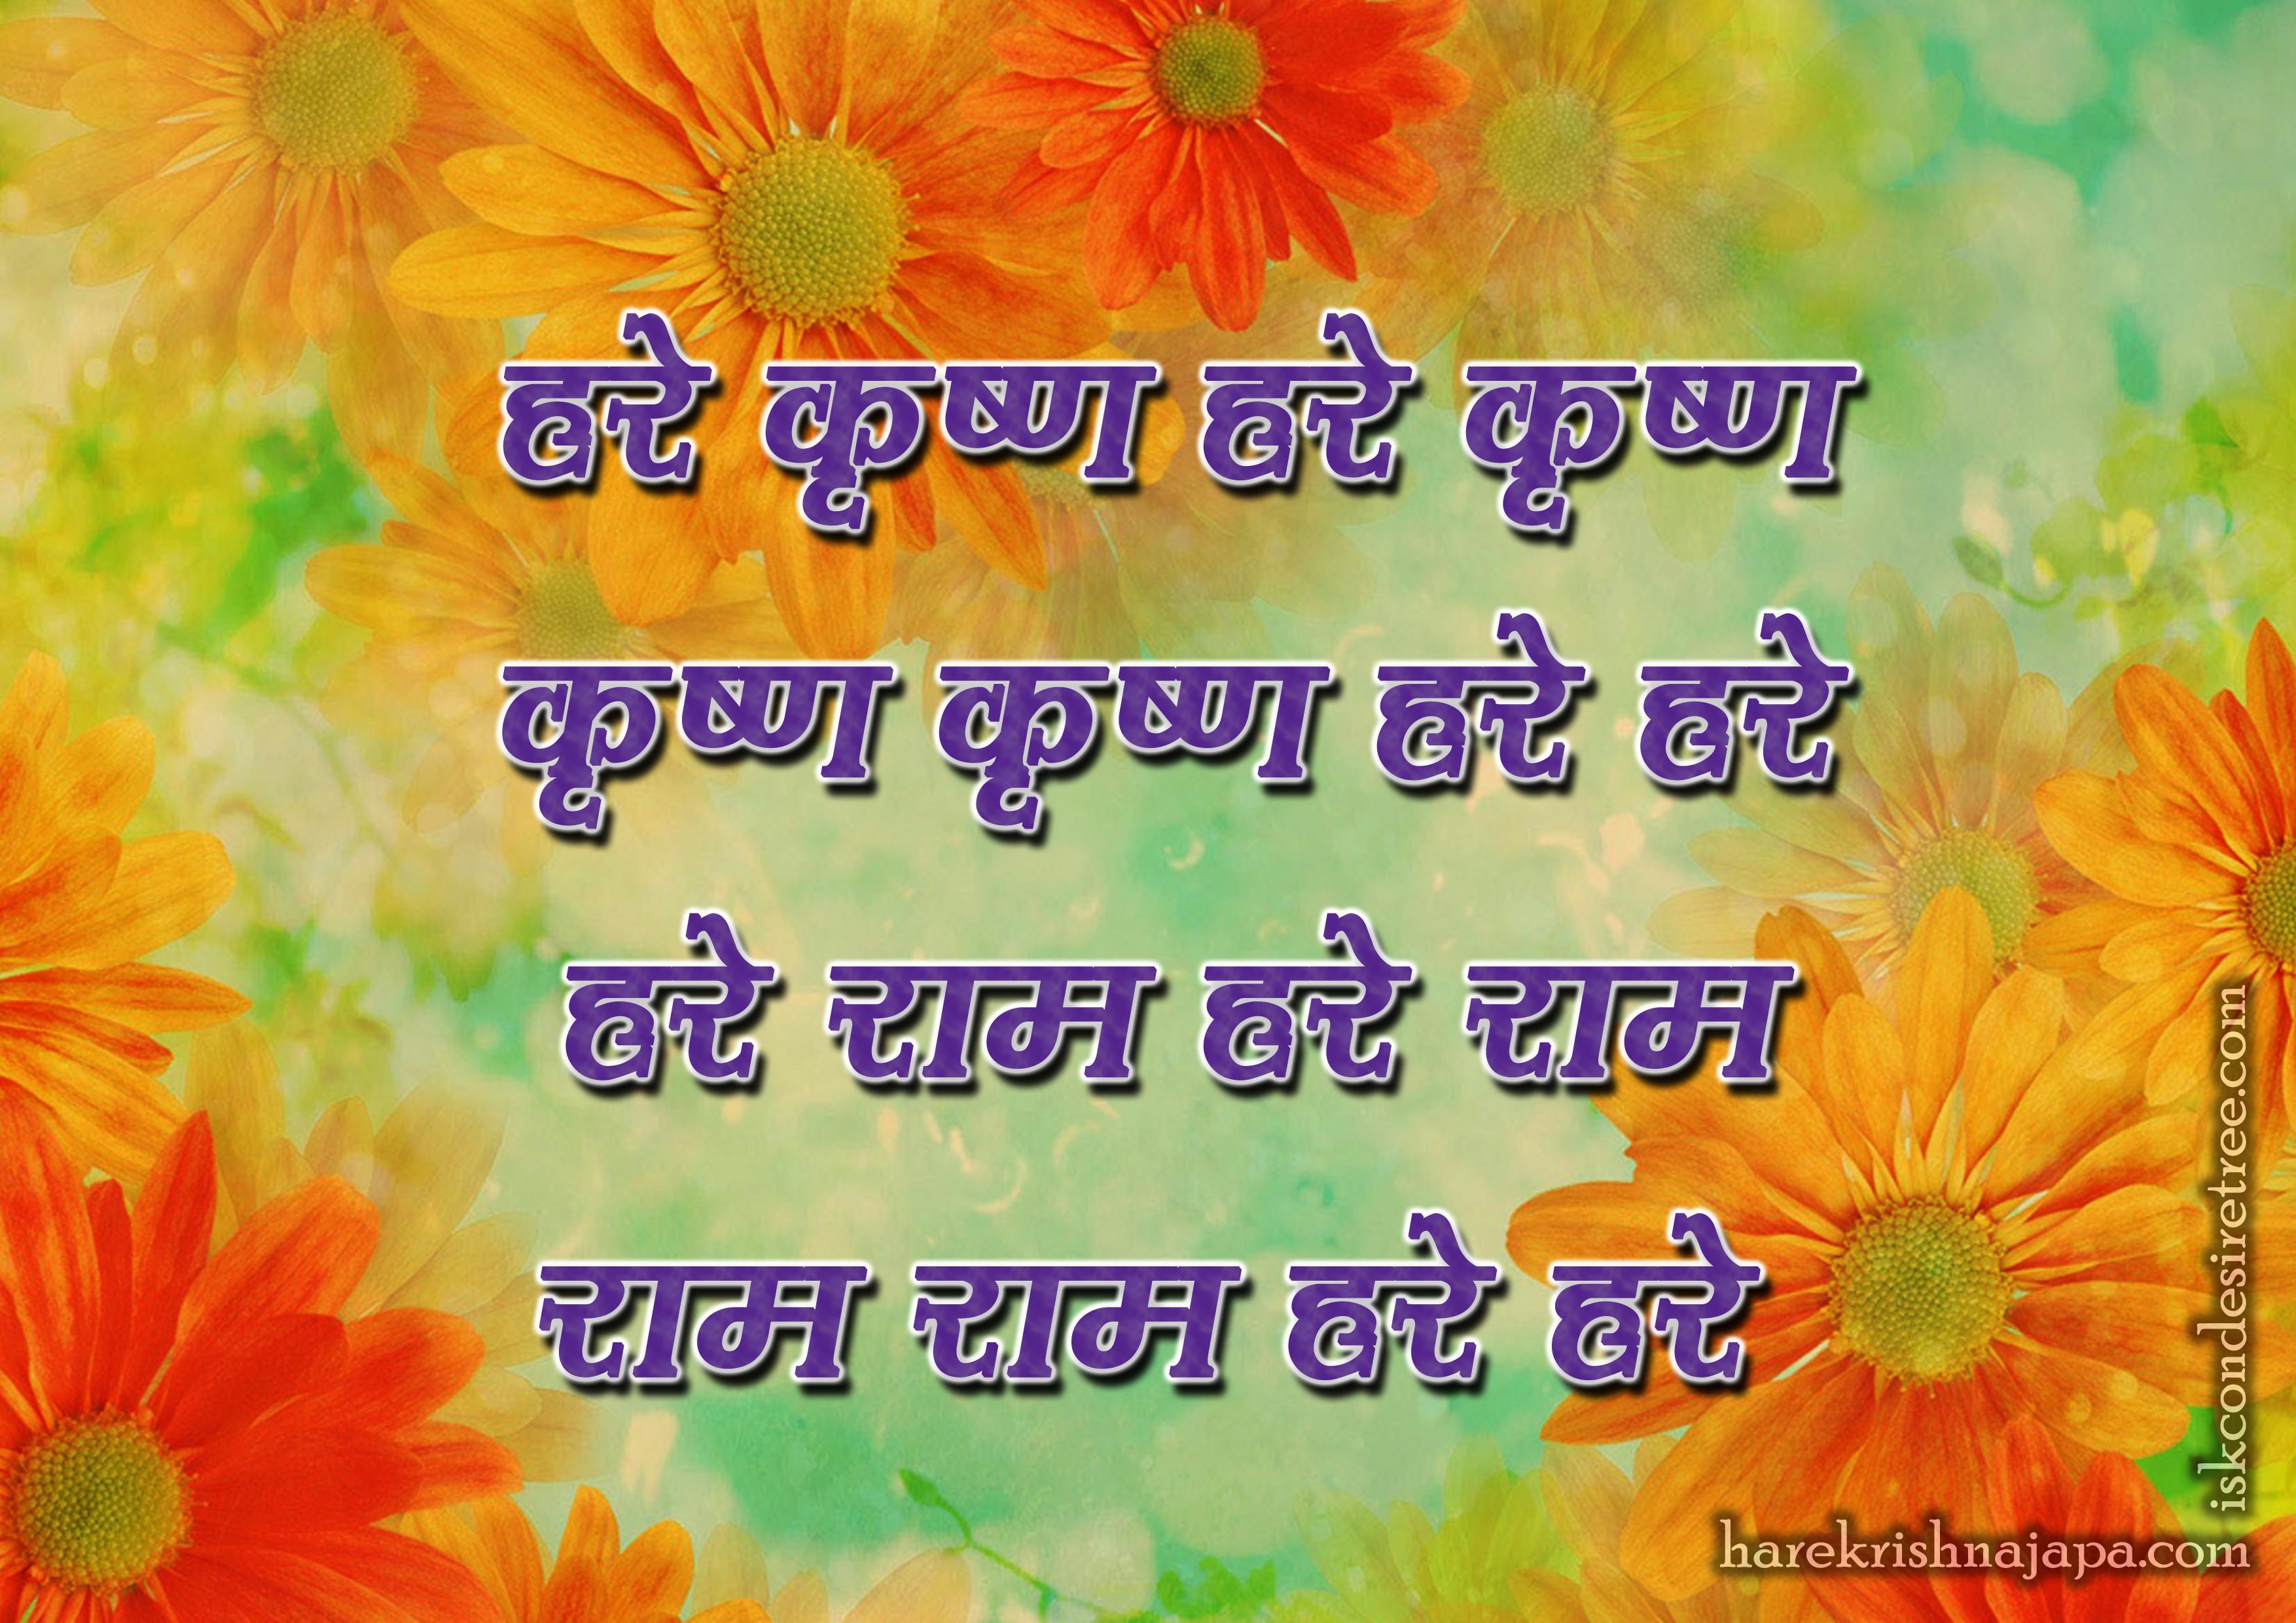 Hare krishna maha mantra in marathi 003 hare krishna japa download hi res izmirmasajfo